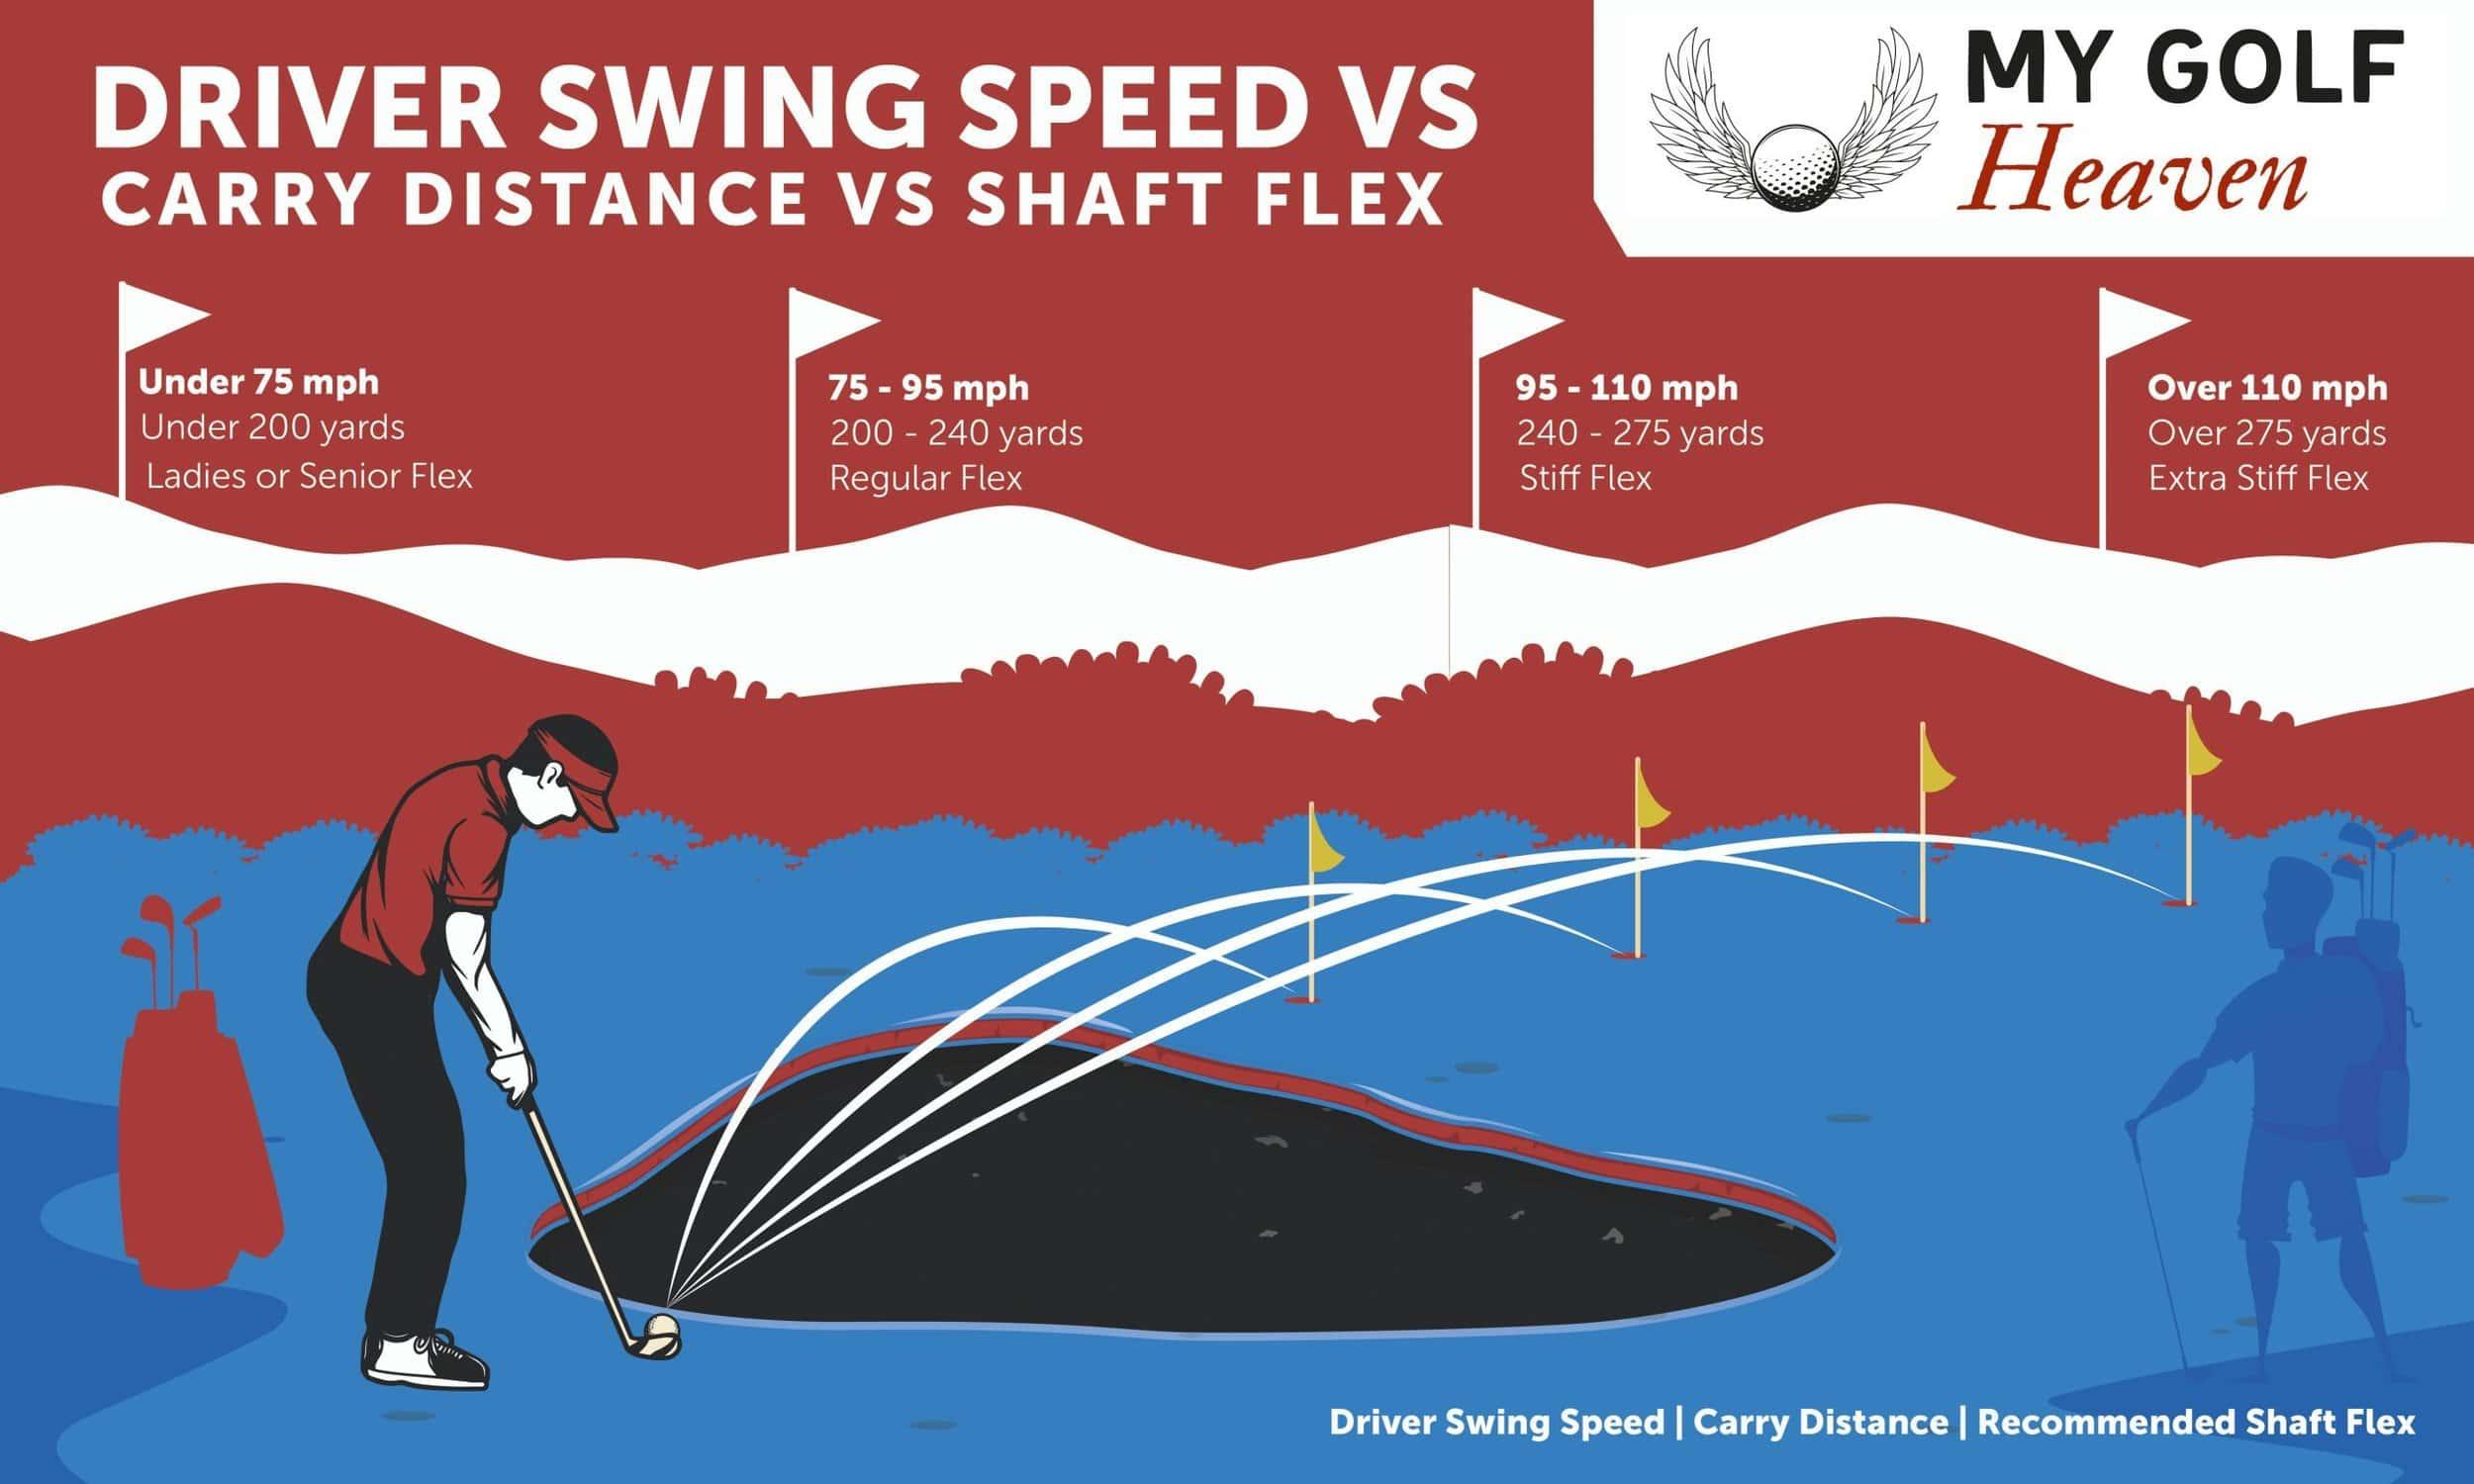 Swing Speed vs Carry Distance vs Shaft Flex